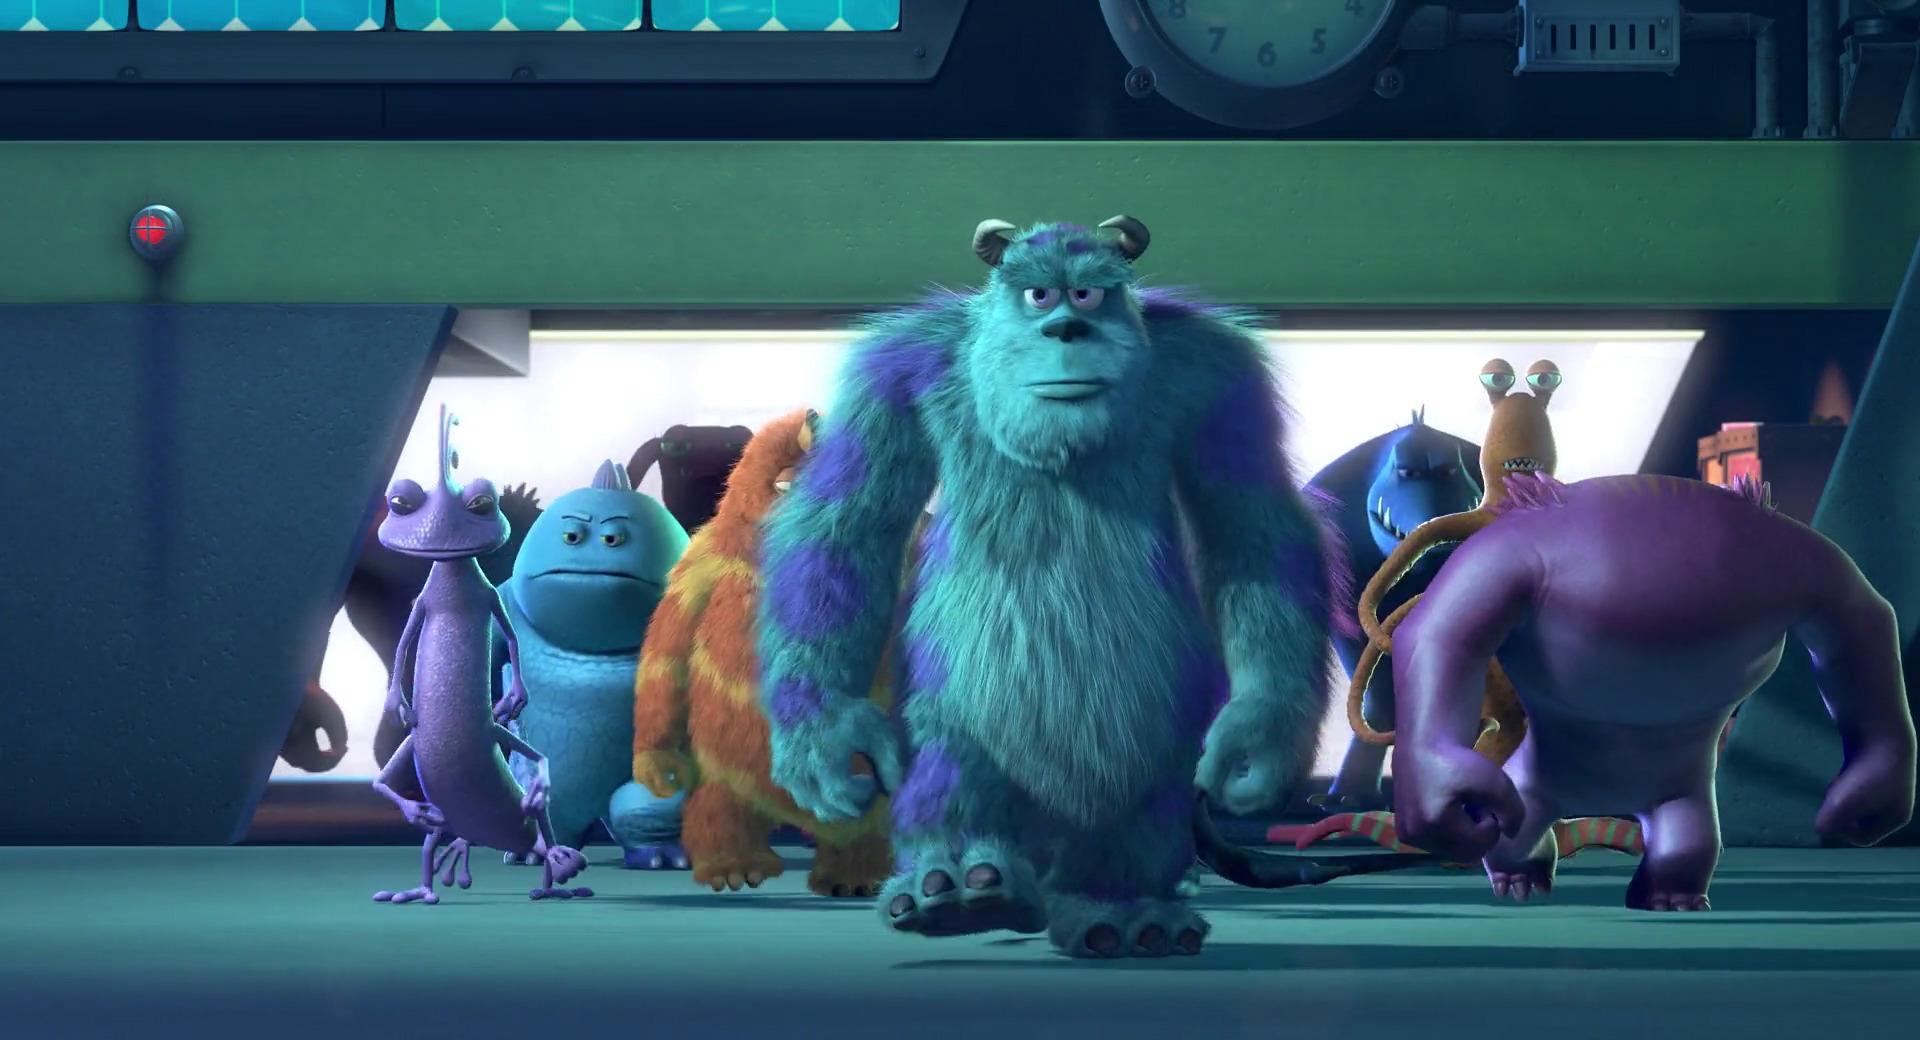 monsters inc The latest tweets from monsters, inc ™ (@monstersinc) boo, mike wazowski, james p sullivan (sulley), walt disney animation studios, disney, disney pixar.